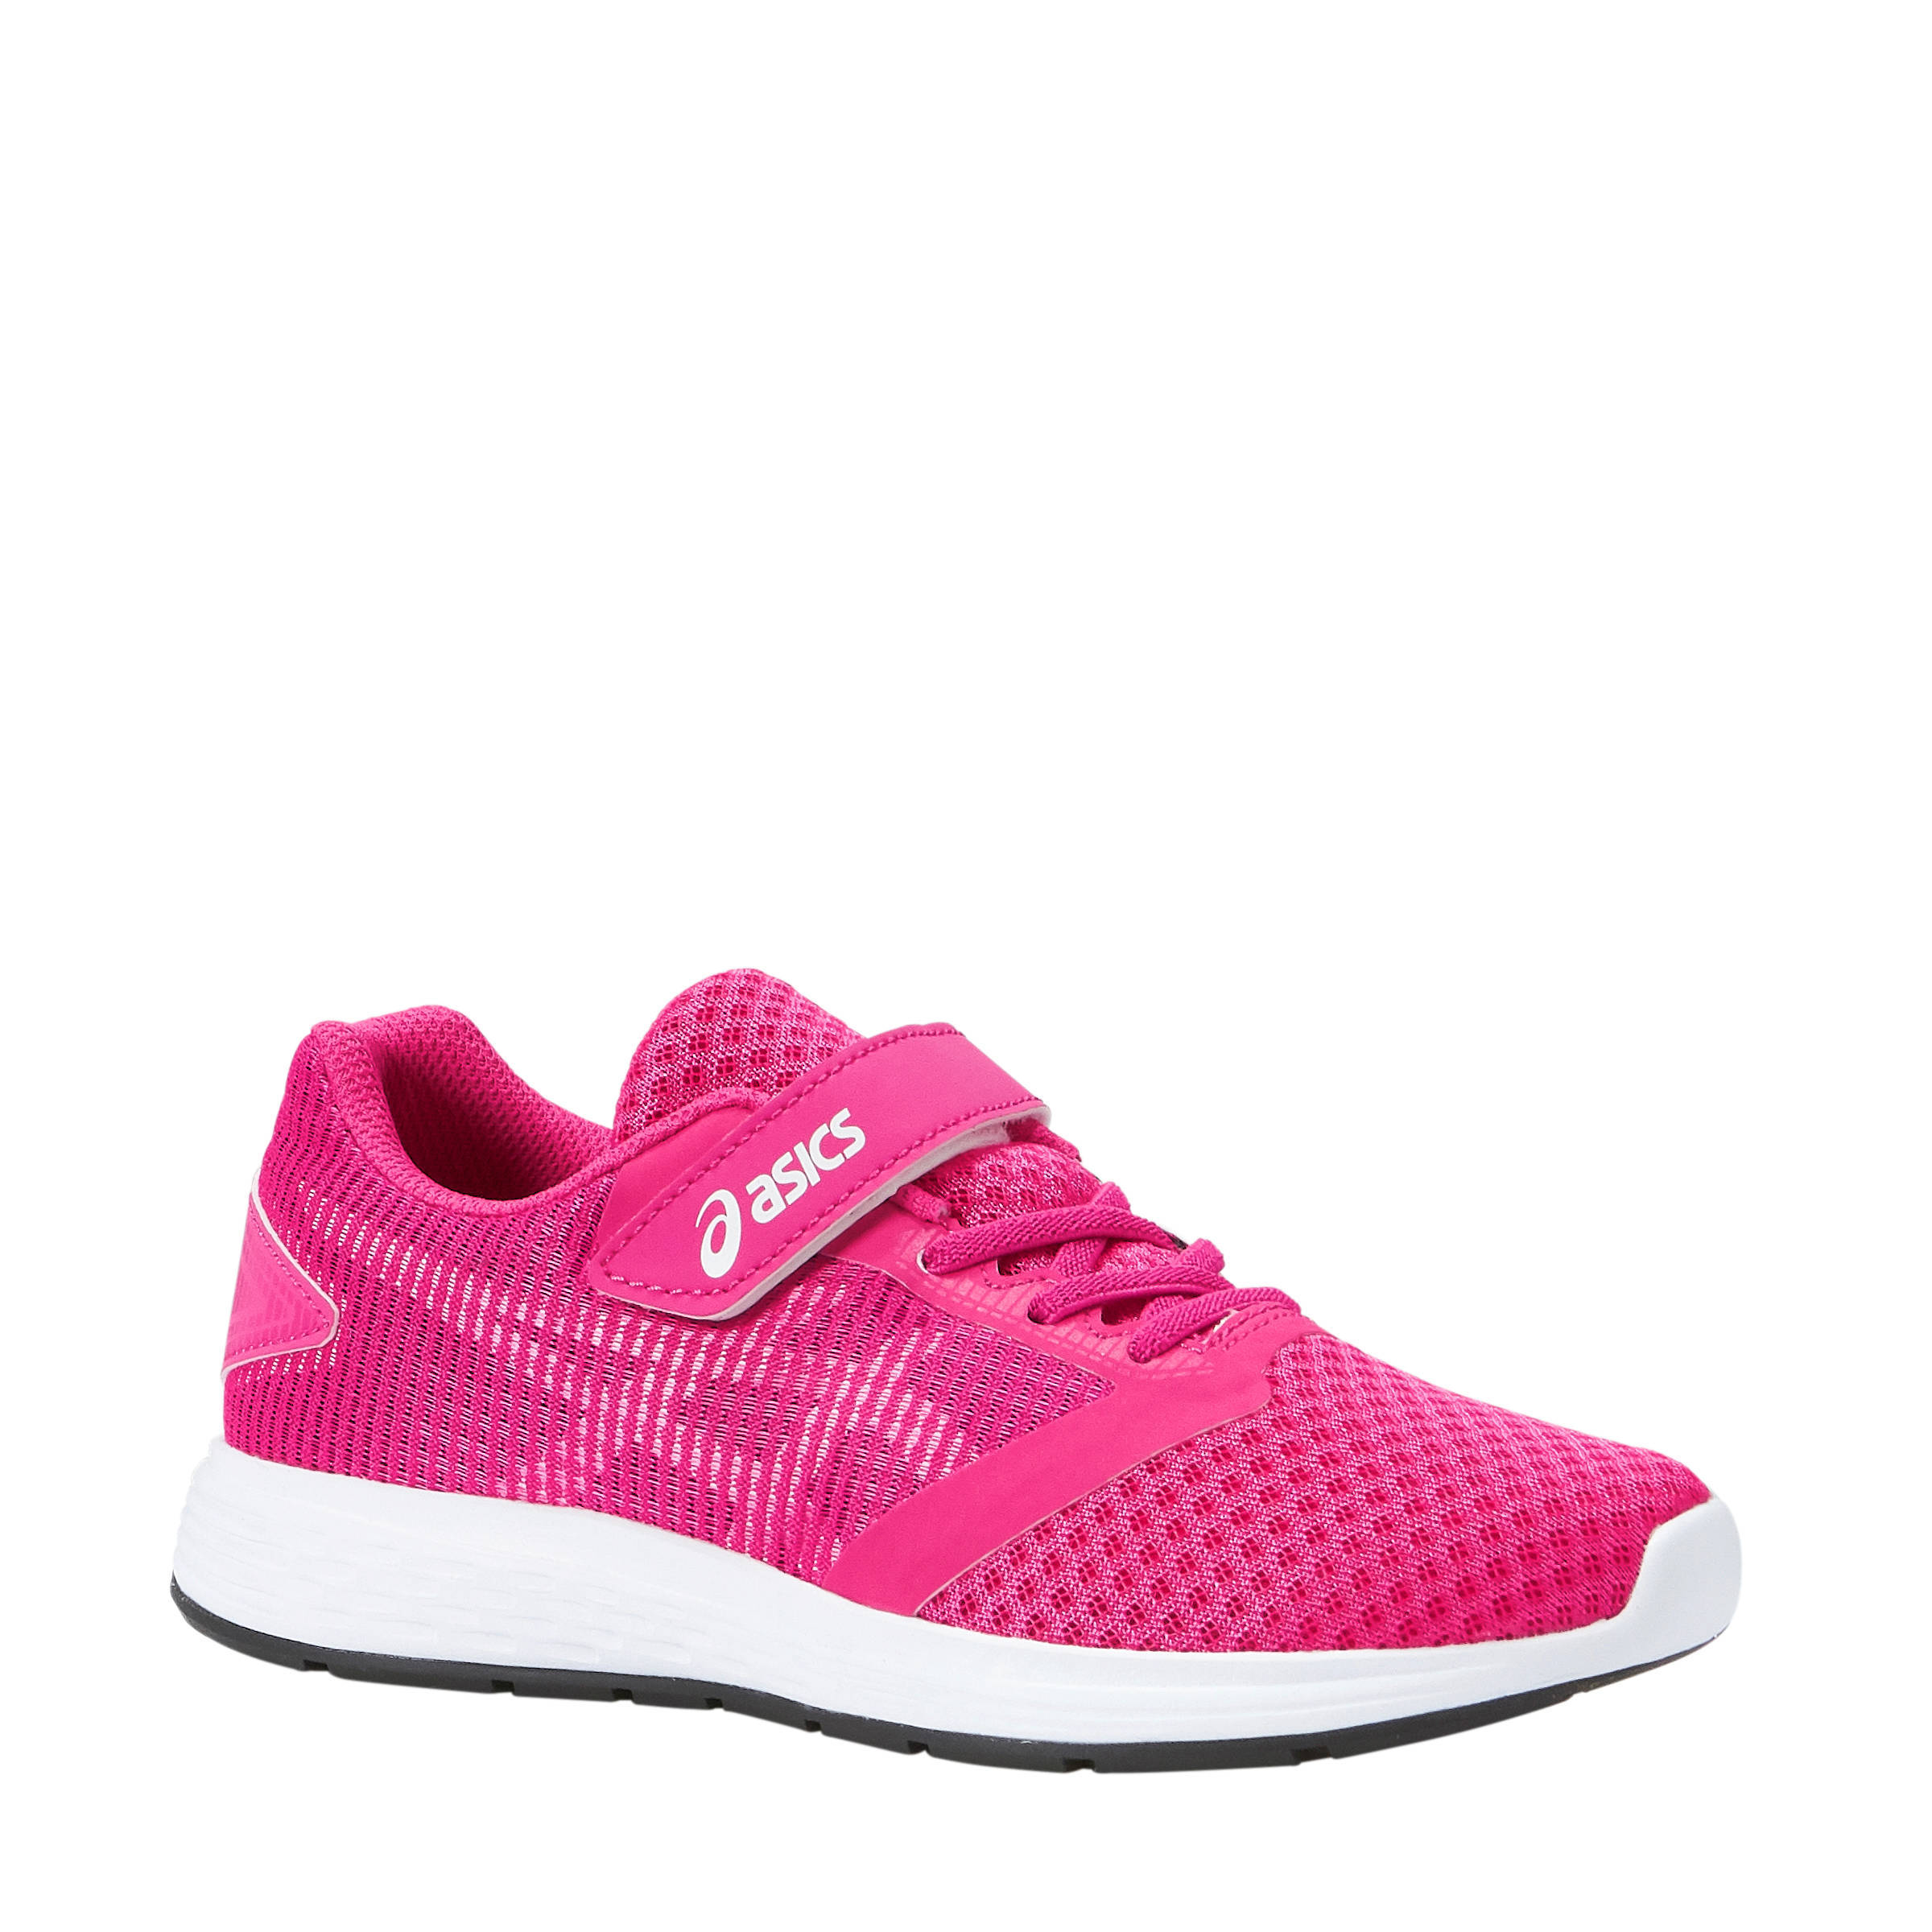 asics hardloopschoenen roze